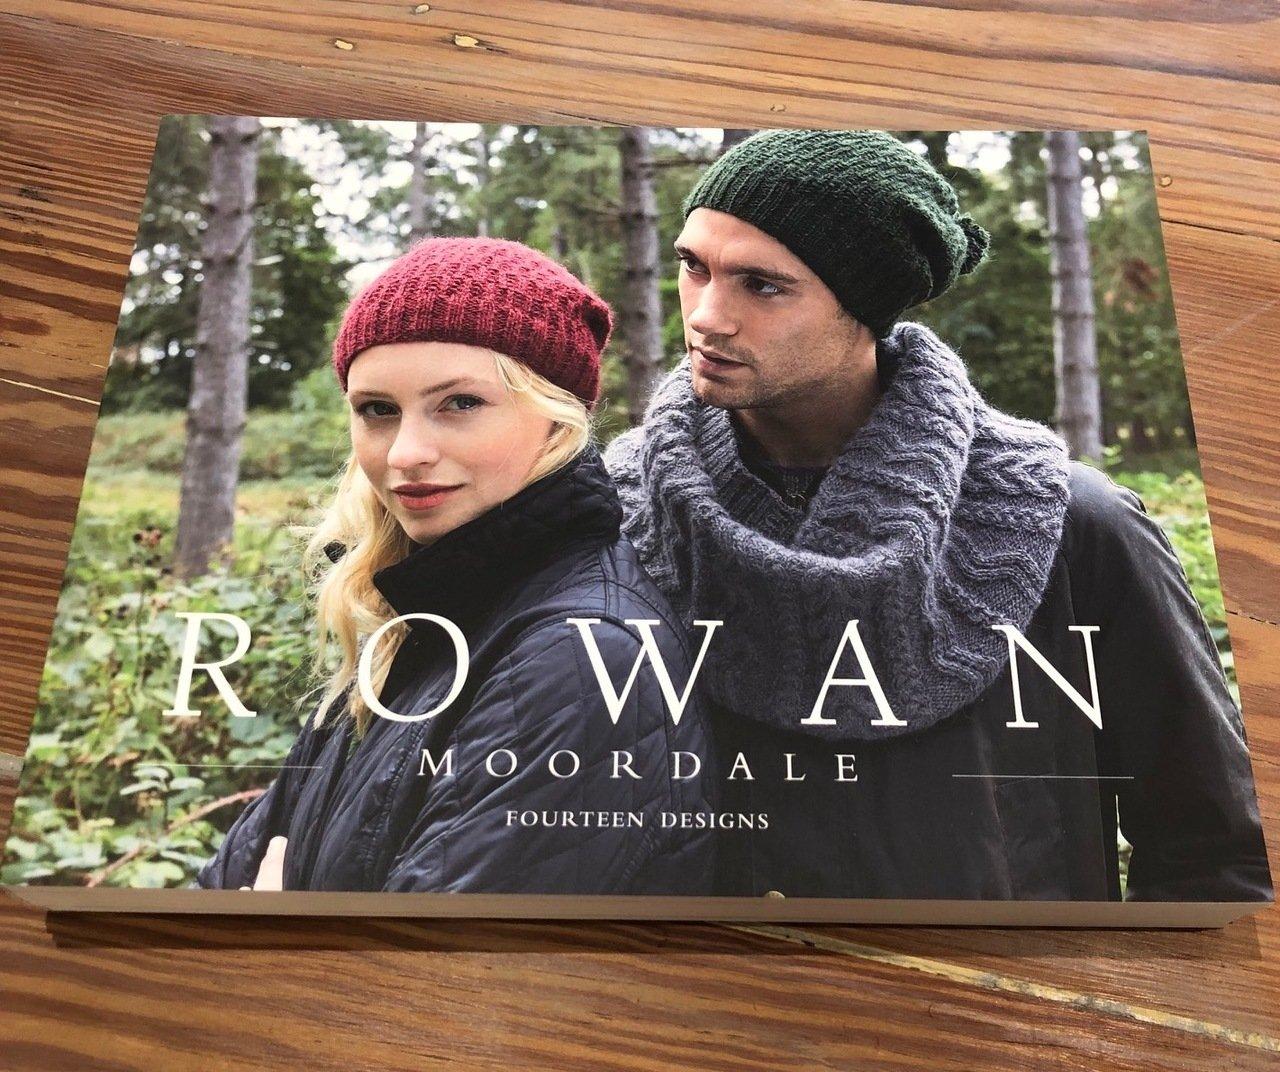 Rowan Moordale Fourteen Designs